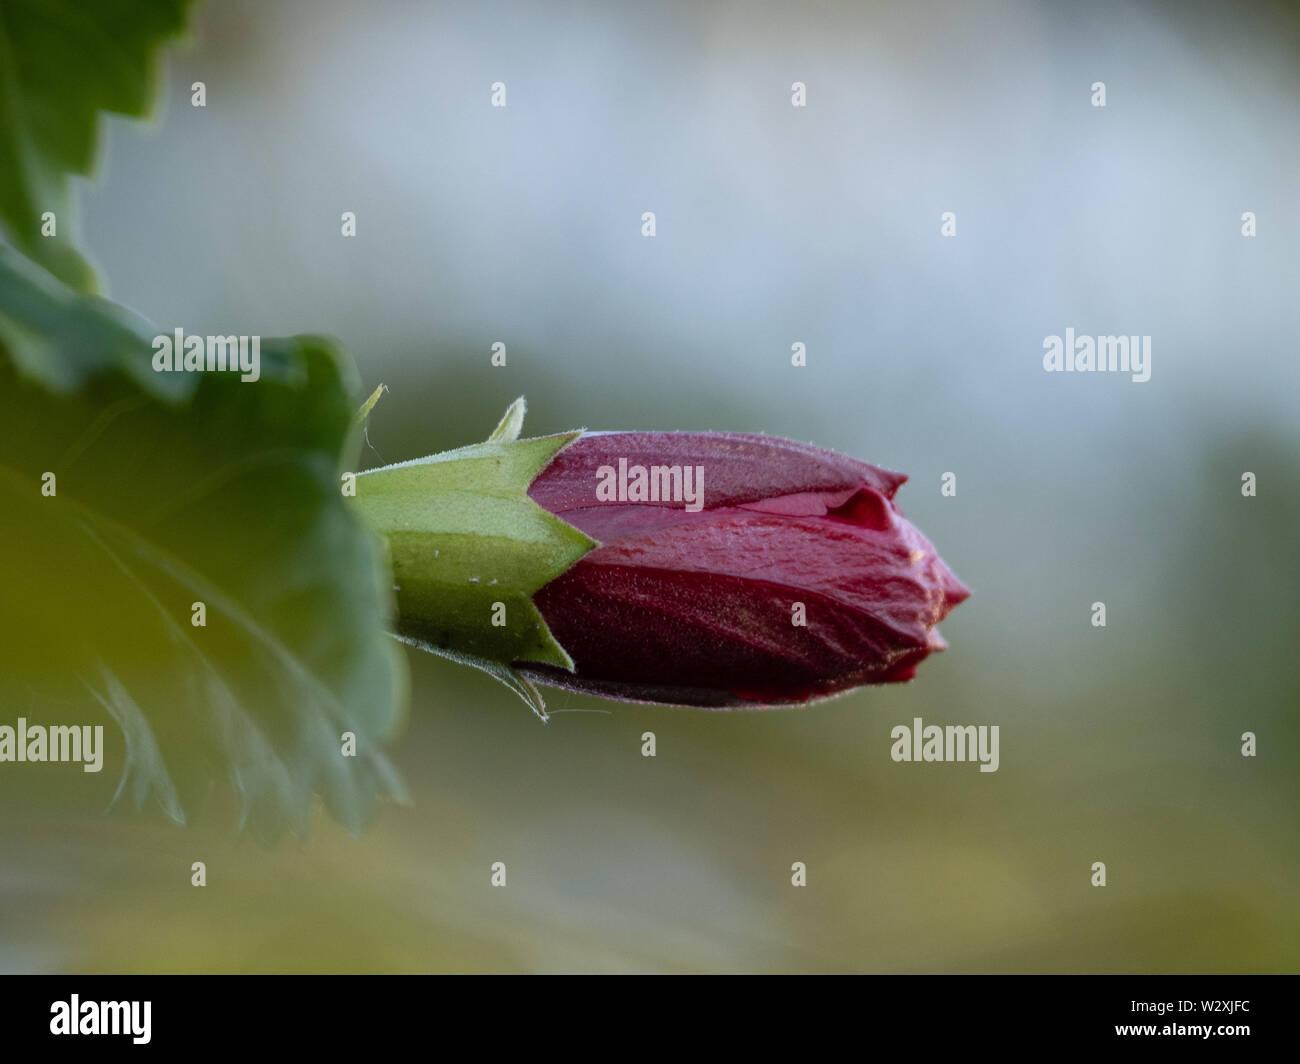 Sub Tropical Plants Plants Gardening Australia Australian High Resolution Stock Photography And Images Alamy